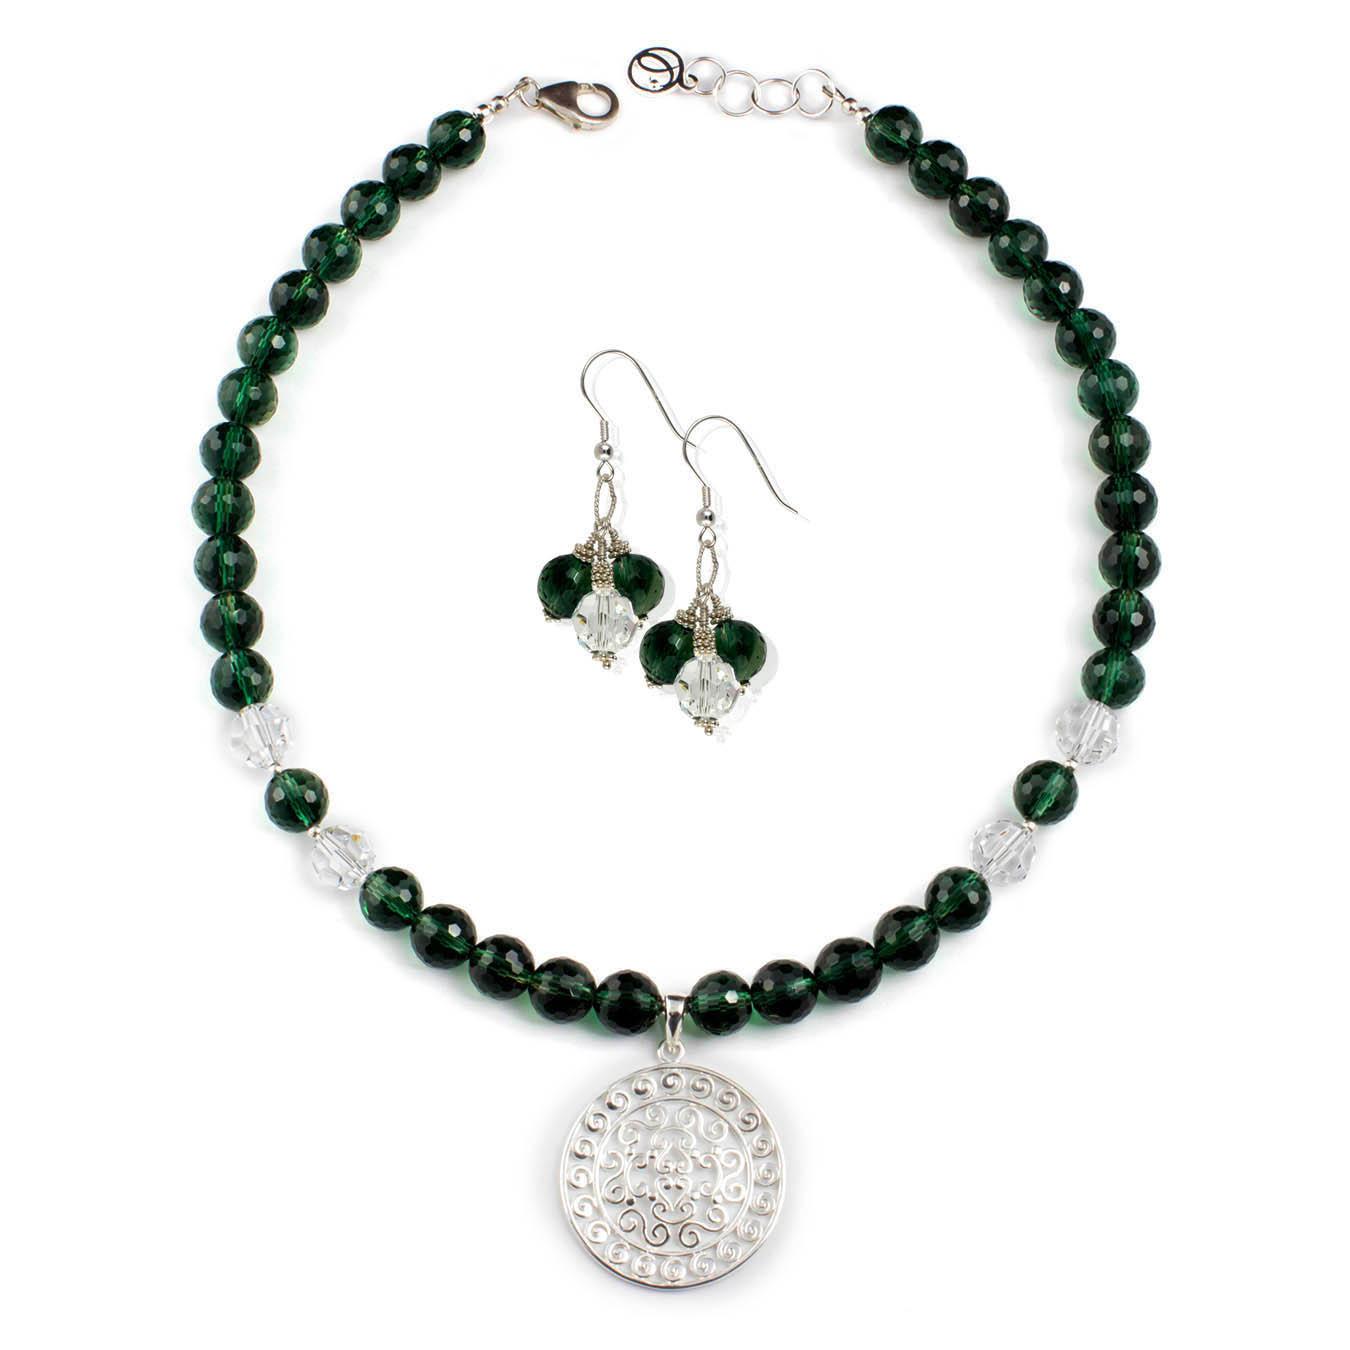 Silver pendant necklace set made with green quartz and swarovski